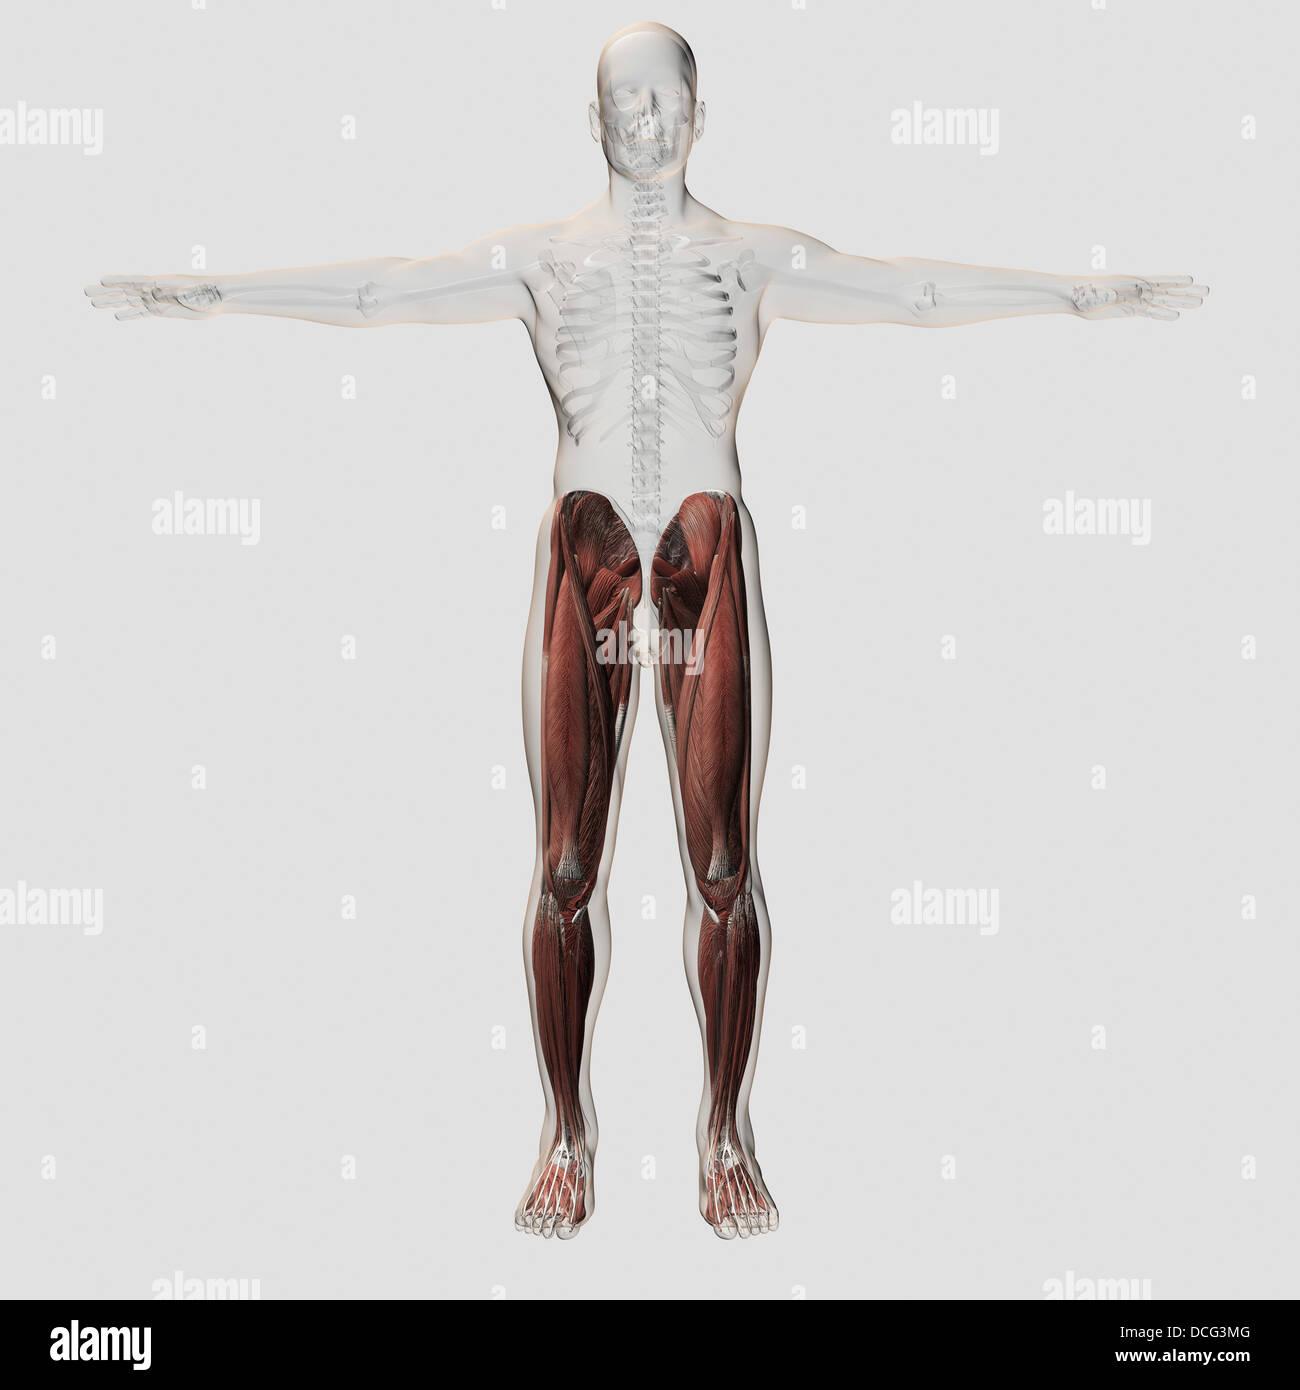 Iliacus Muscle Imágenes De Stock & Iliacus Muscle Fotos De Stock - Alamy